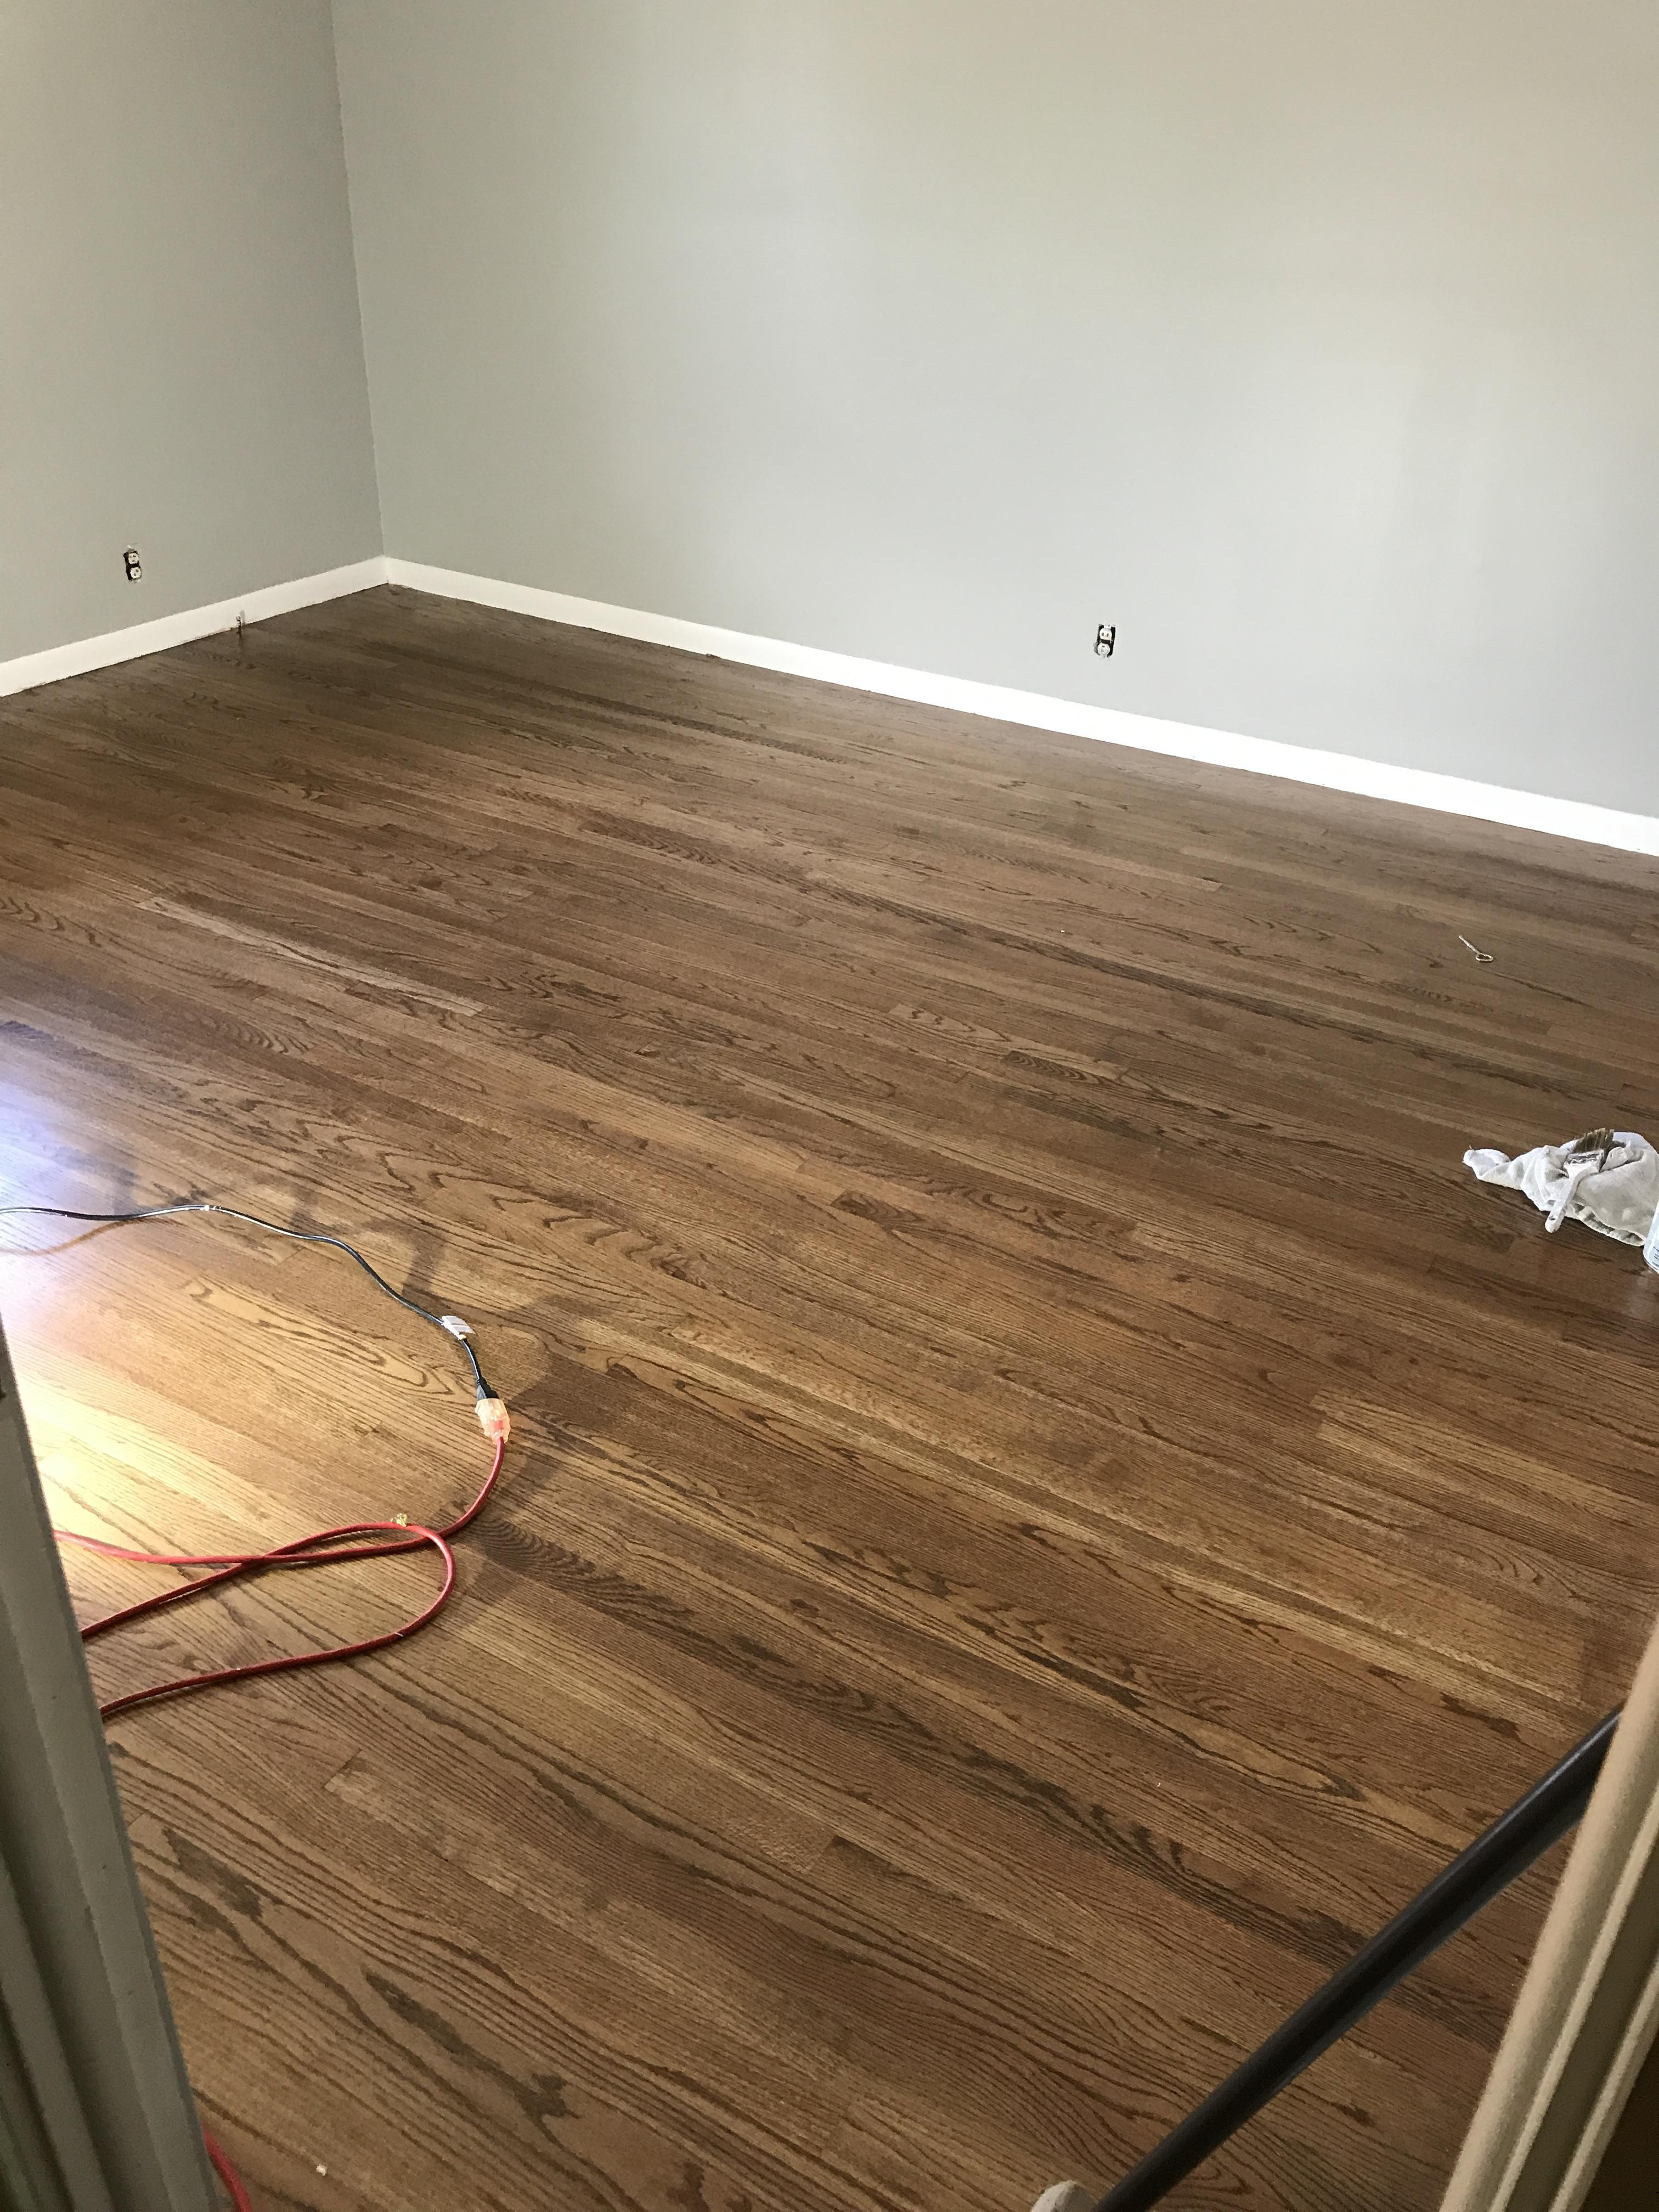 Hardwood Floor Refinishing Wichita Ks Of Http Imgur Com Gallery Pjwzx Daily Http Imgur Com 9qq29pk Regarding Ahqmxlc